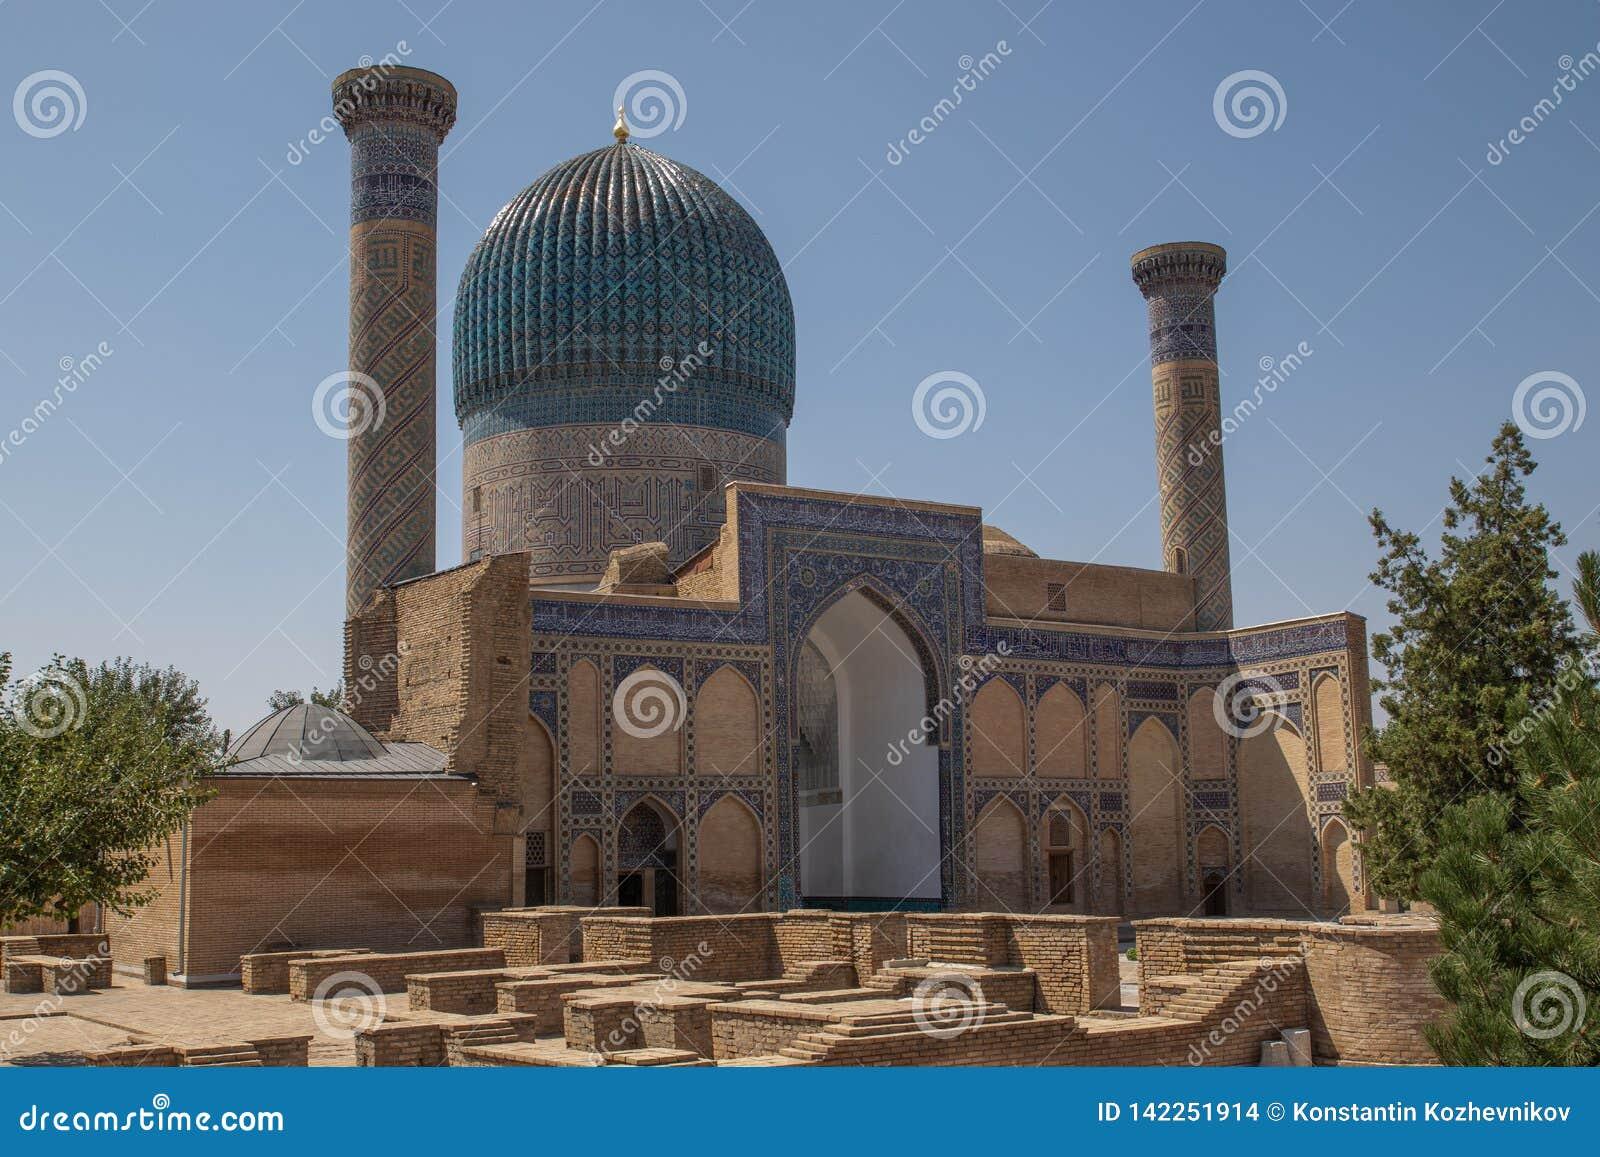 Mausoleo del Gur-emir en Samarkand, Uzbekistán